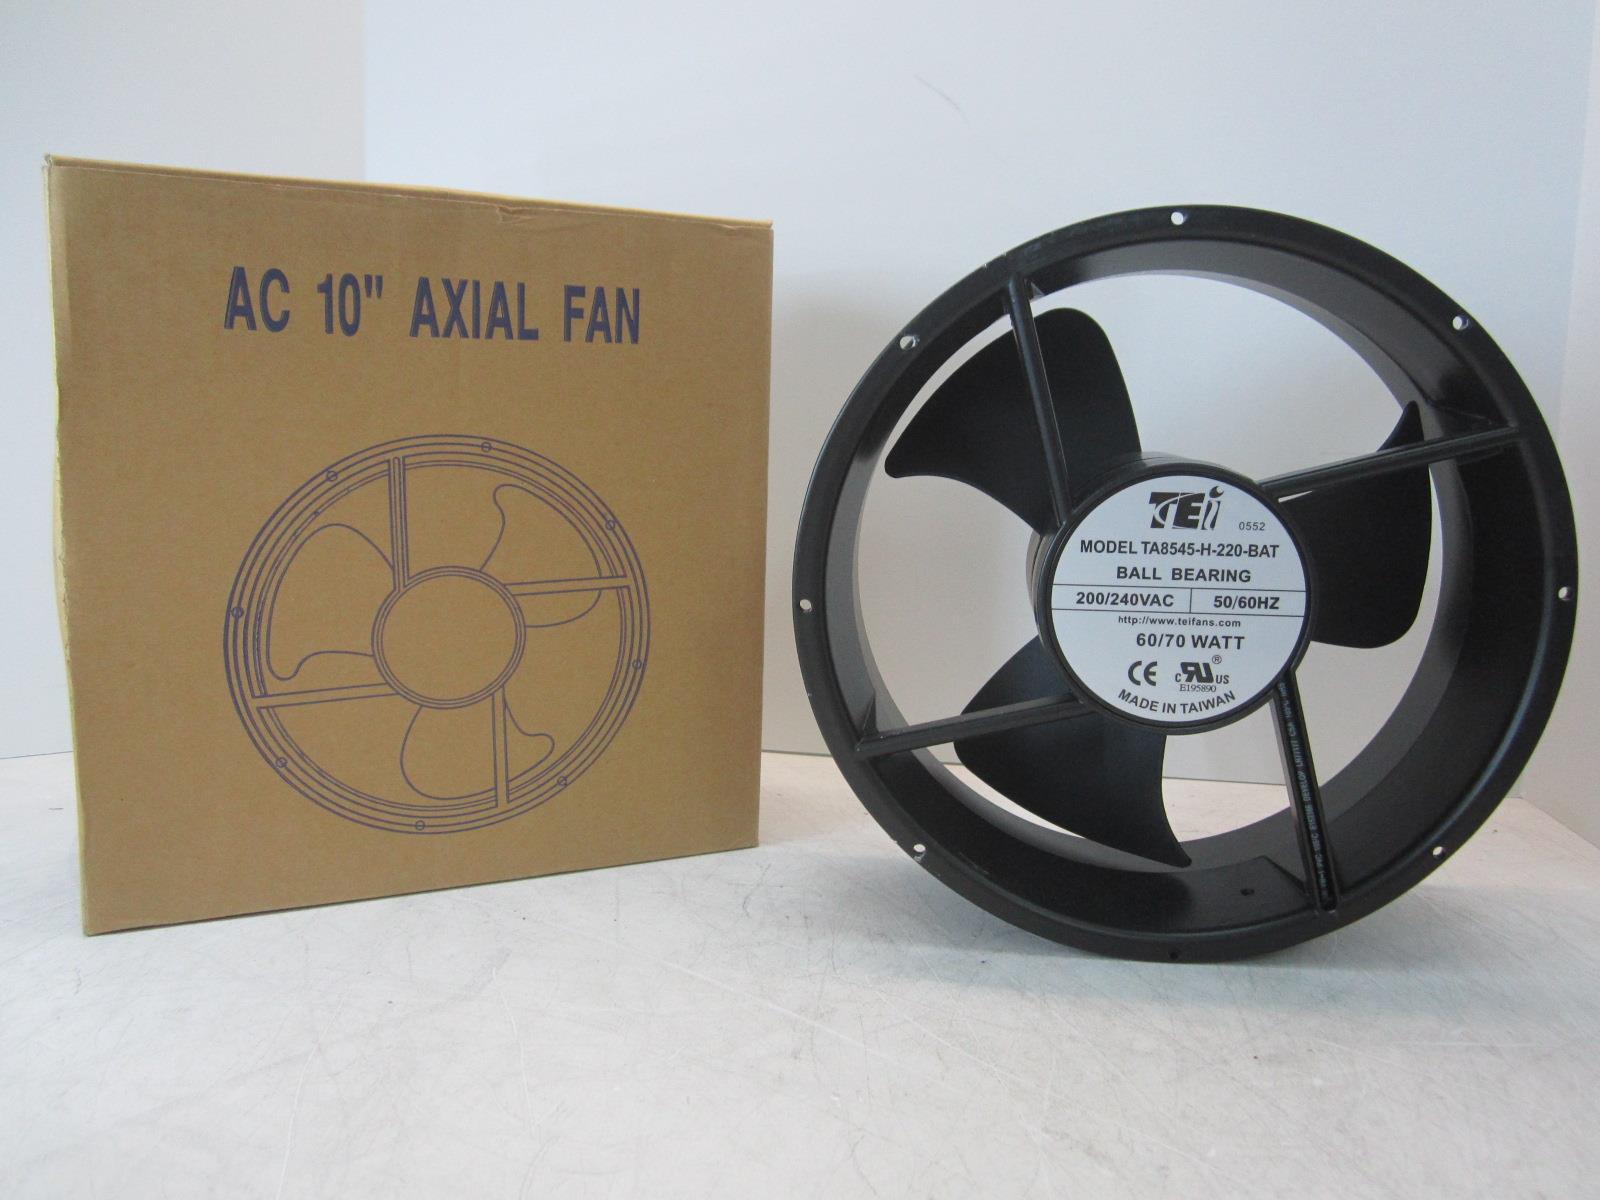 Tei Ta8545 H 220 Bat Ac 10 Ball Bearing Axial Fan 200 240 Vac